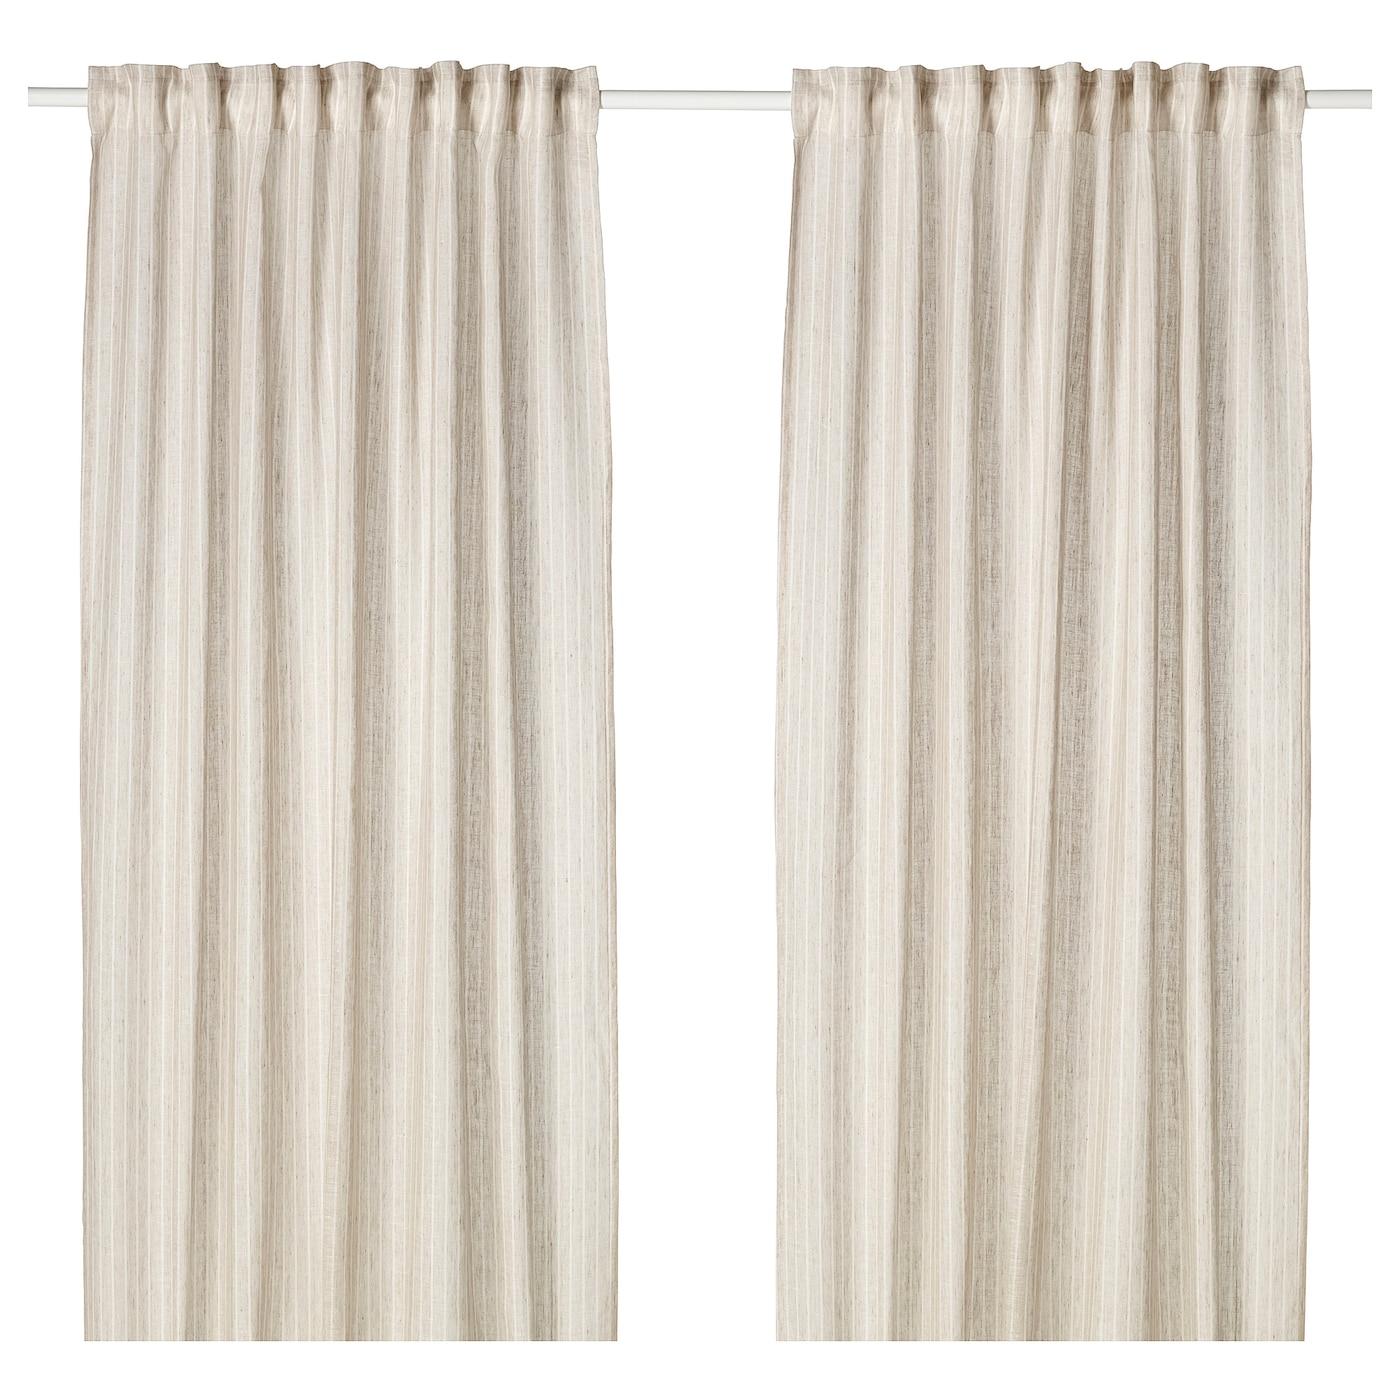 Curtains ready made curtains ikea - Cortinas para salon ikea ...